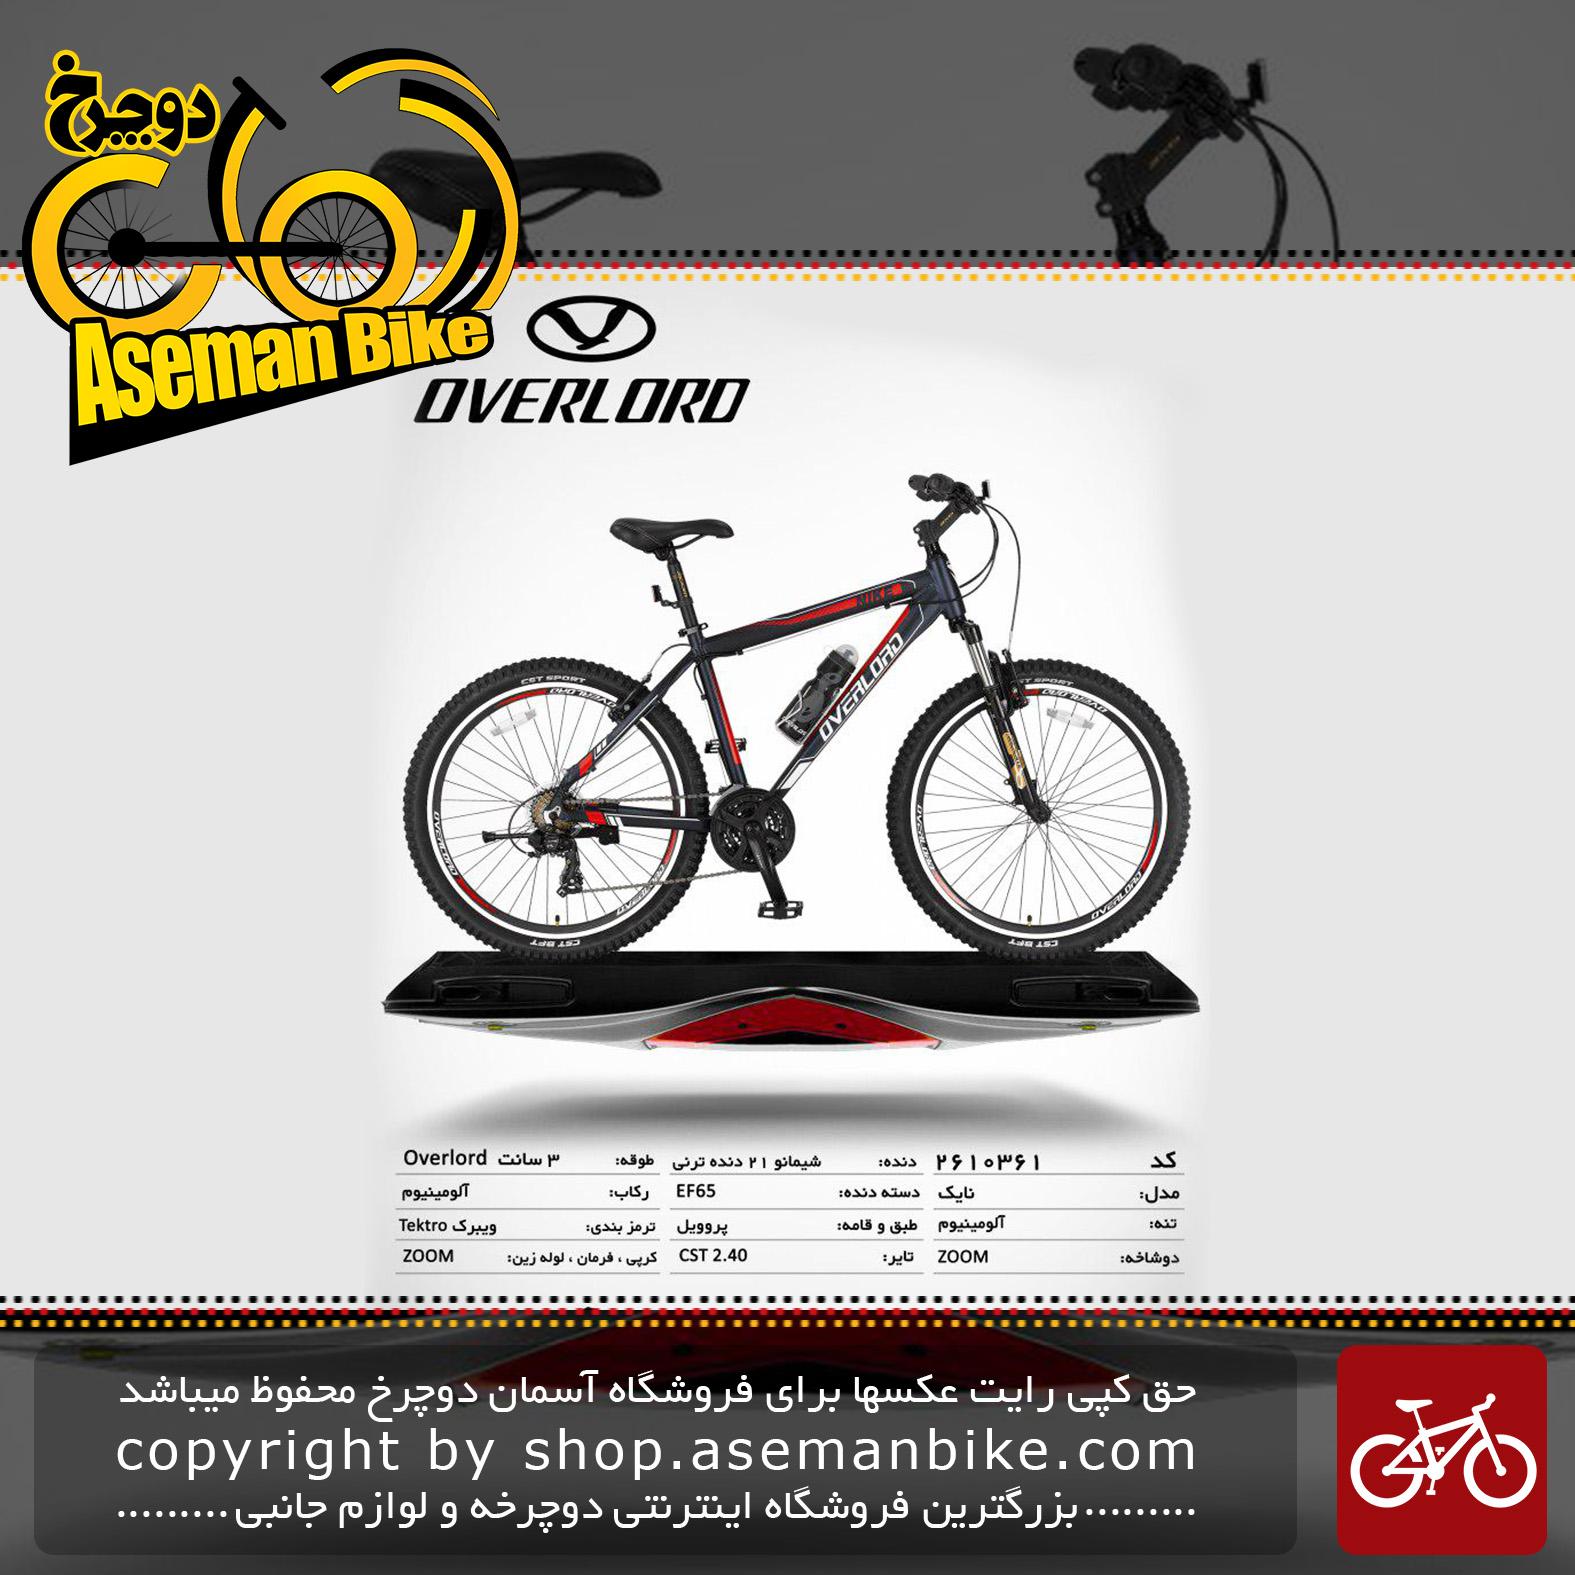 دوچرخه کوهستان شهری اورلرد مدل نایک 21 دنده شیمانو تورنی سایز 26 ساخت تایوان OVERLORD Mountain City Taiwan Bicycle NIKE 26 2019